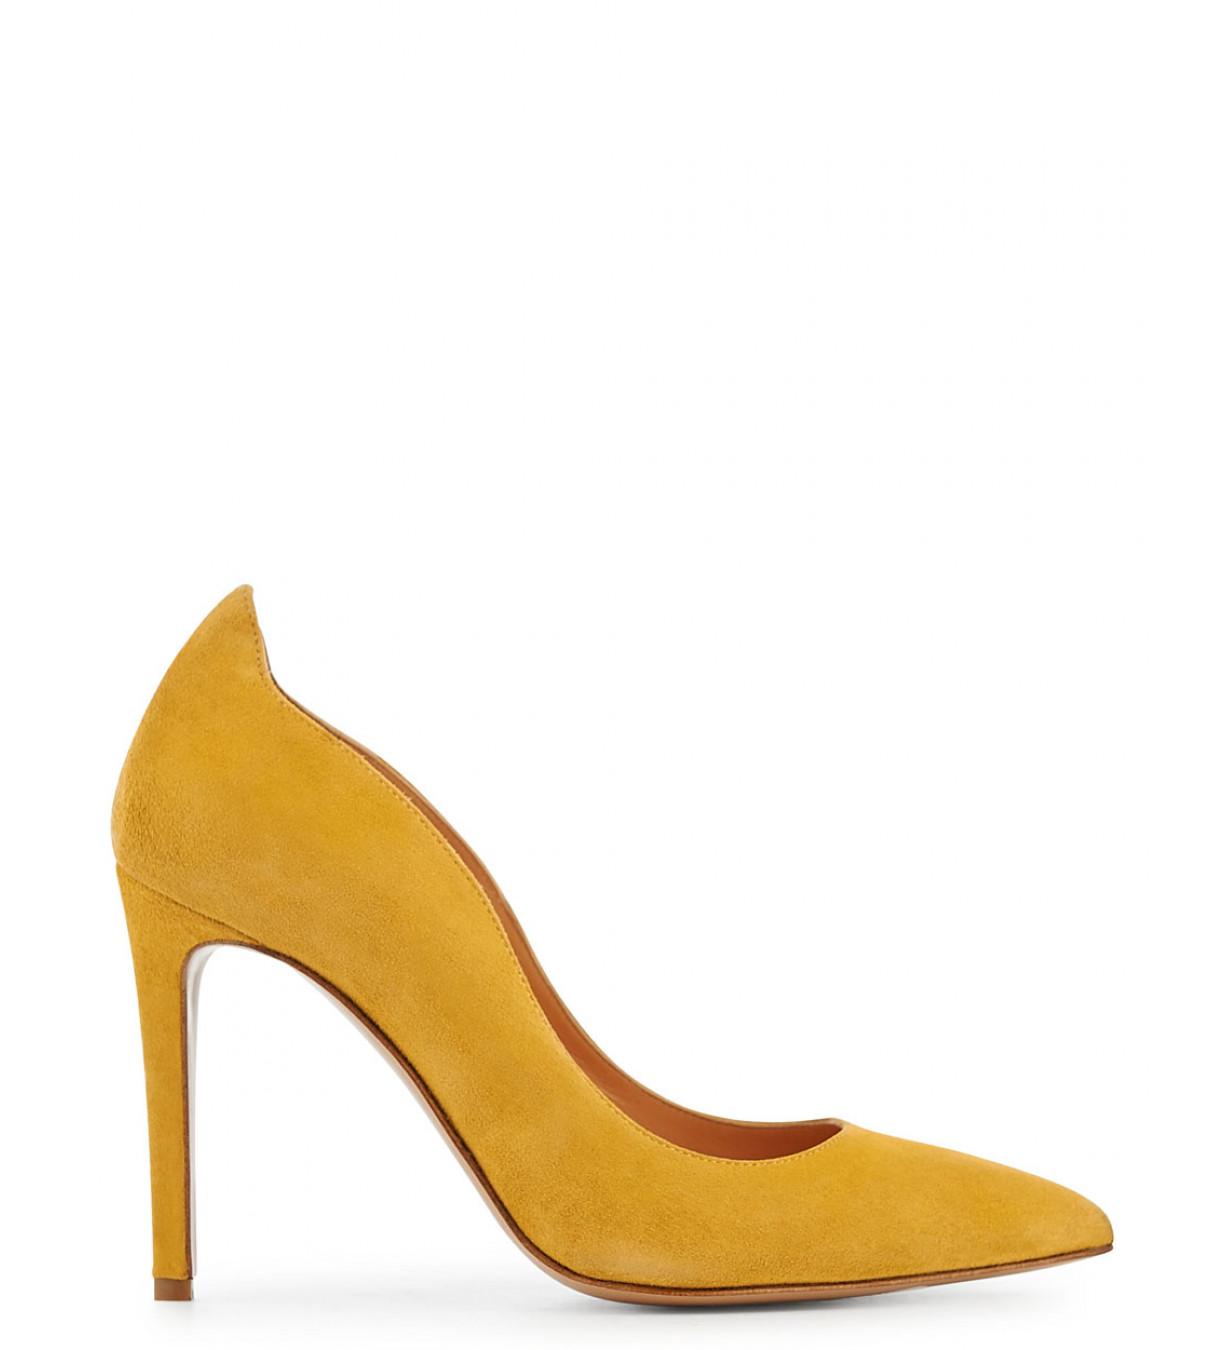 12. escarpins-hauts-jaune-chevre-velours-chaussures-mariee